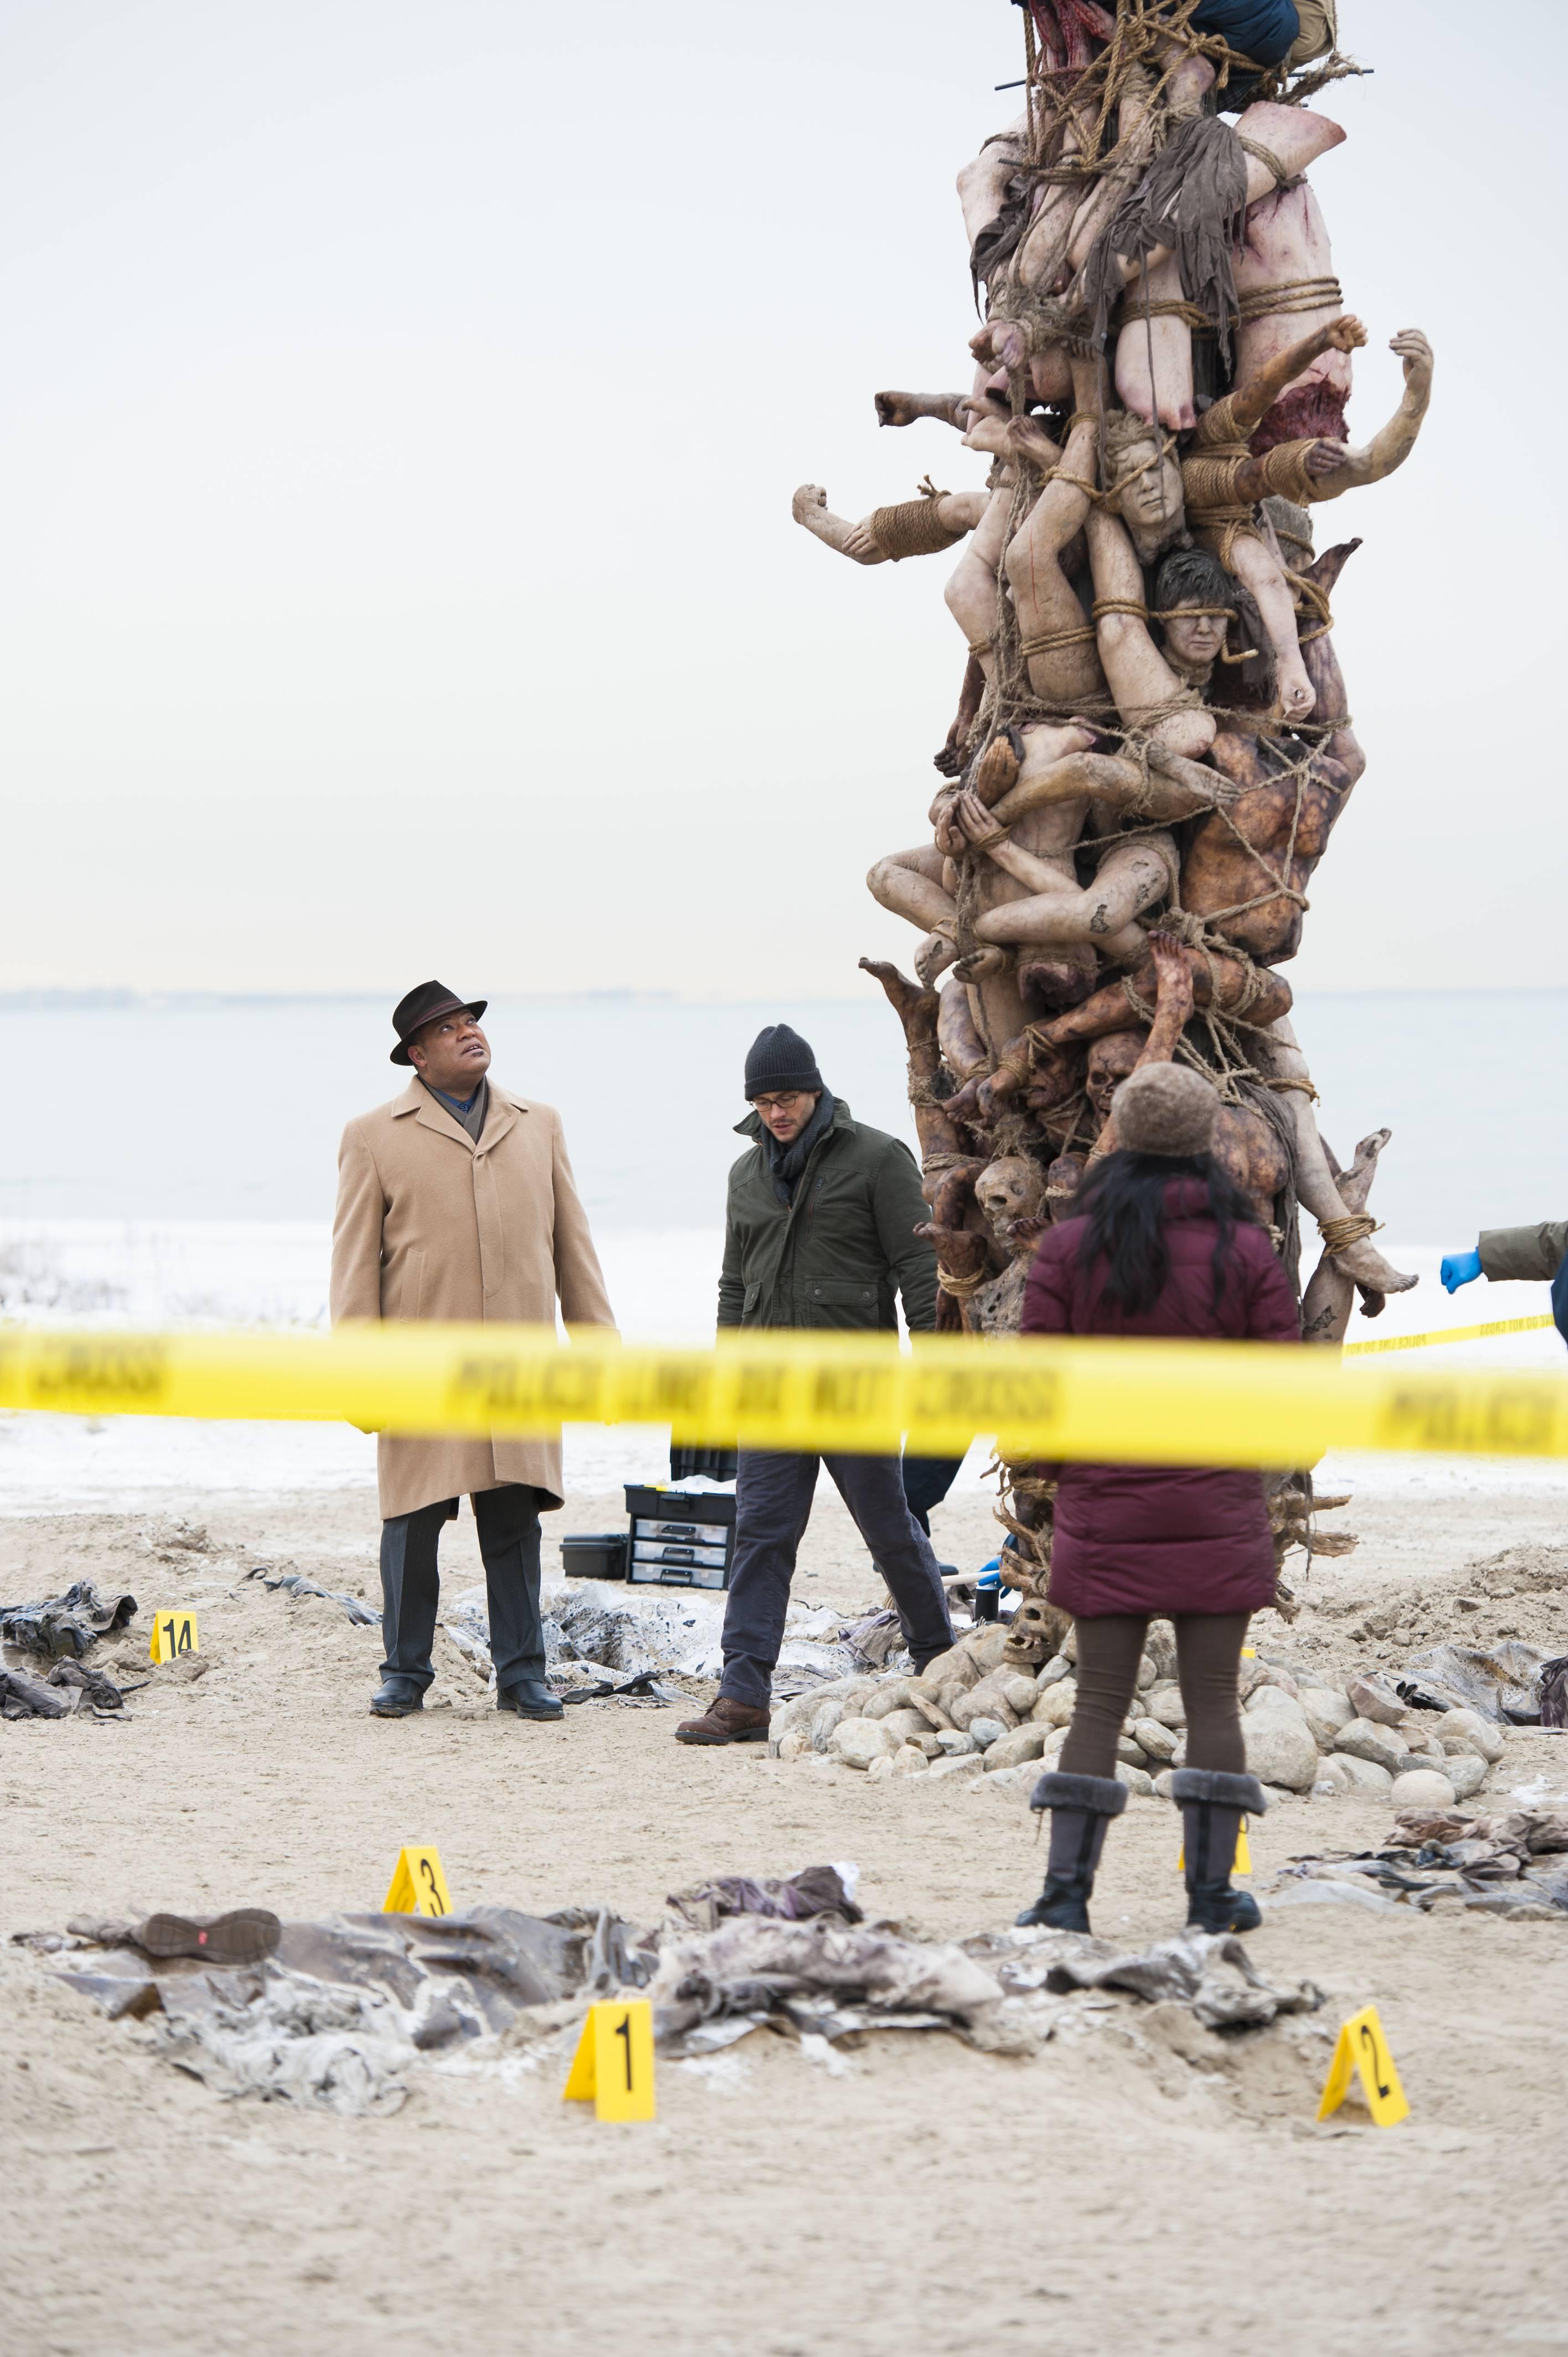 Hannibal - Episode 1.09 - Trou Normand